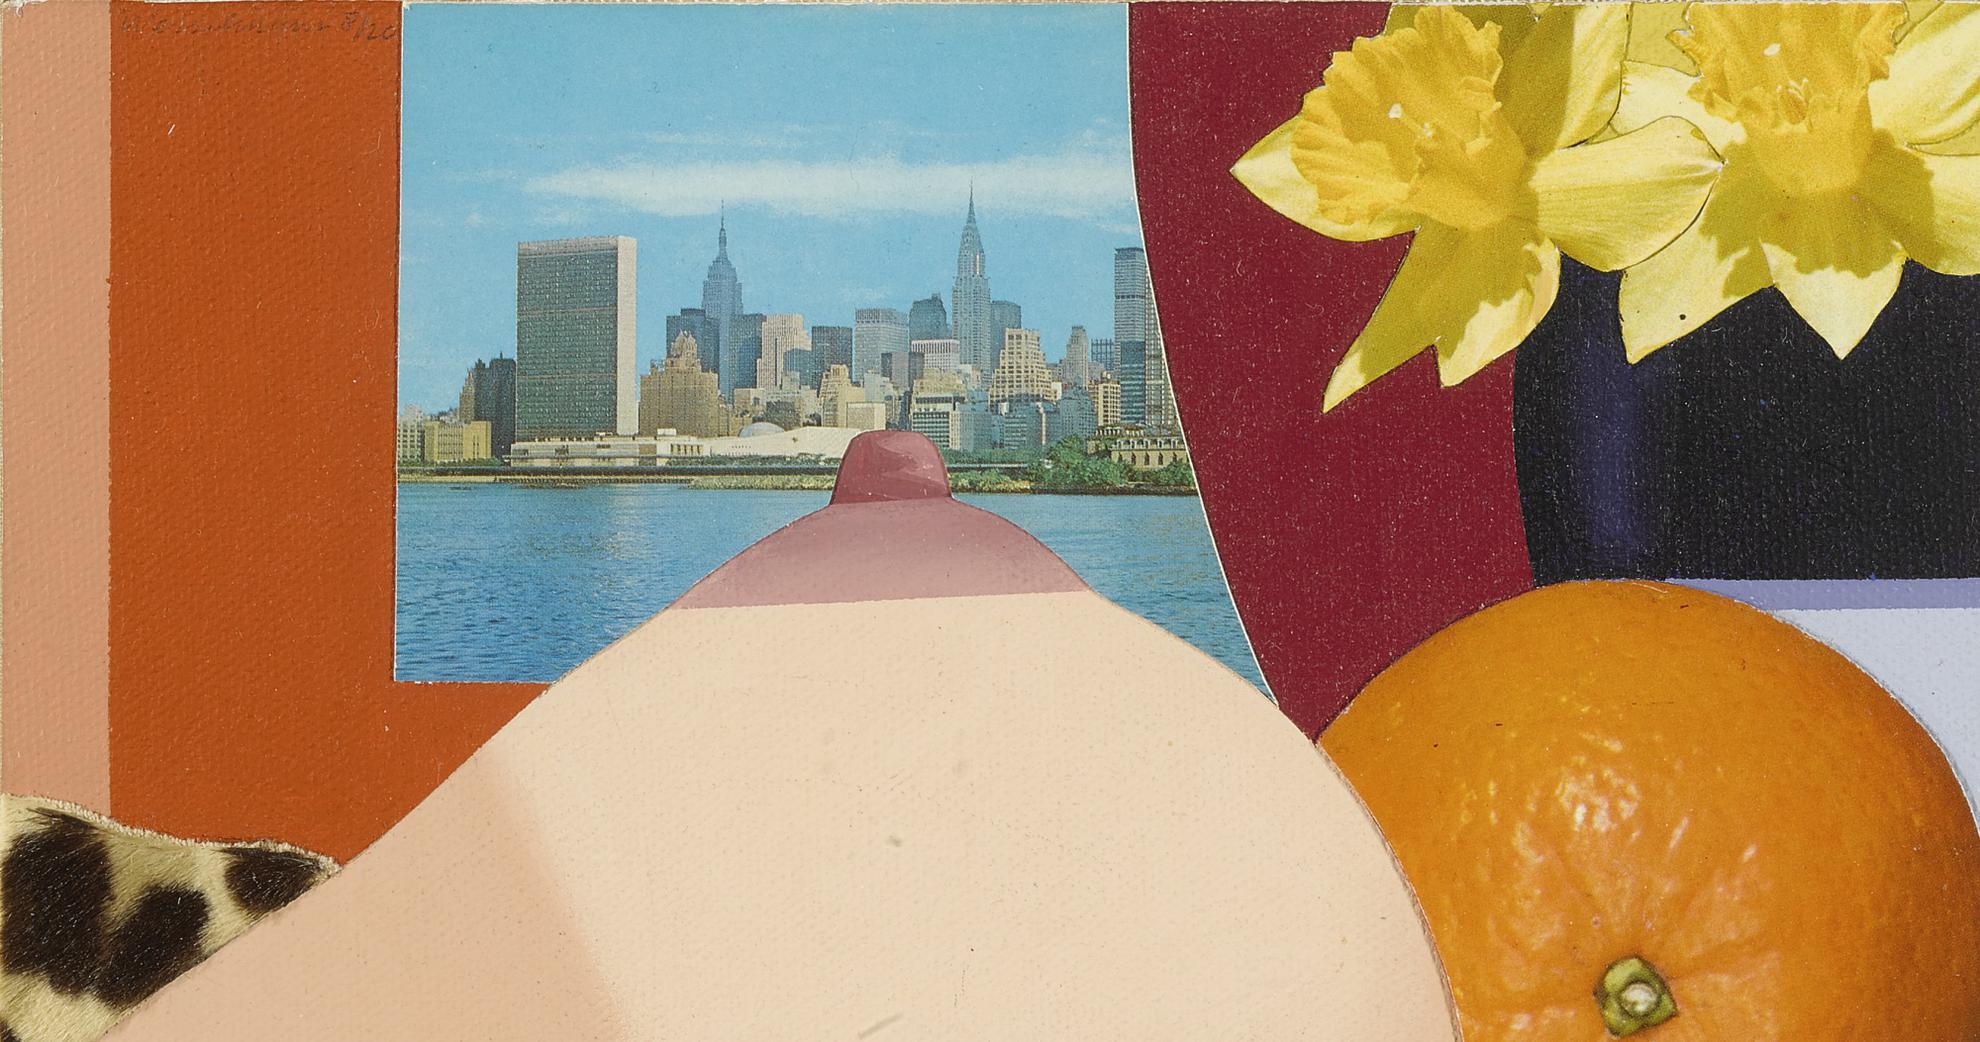 Tom Wesselmann-Bedroom Collage-1975